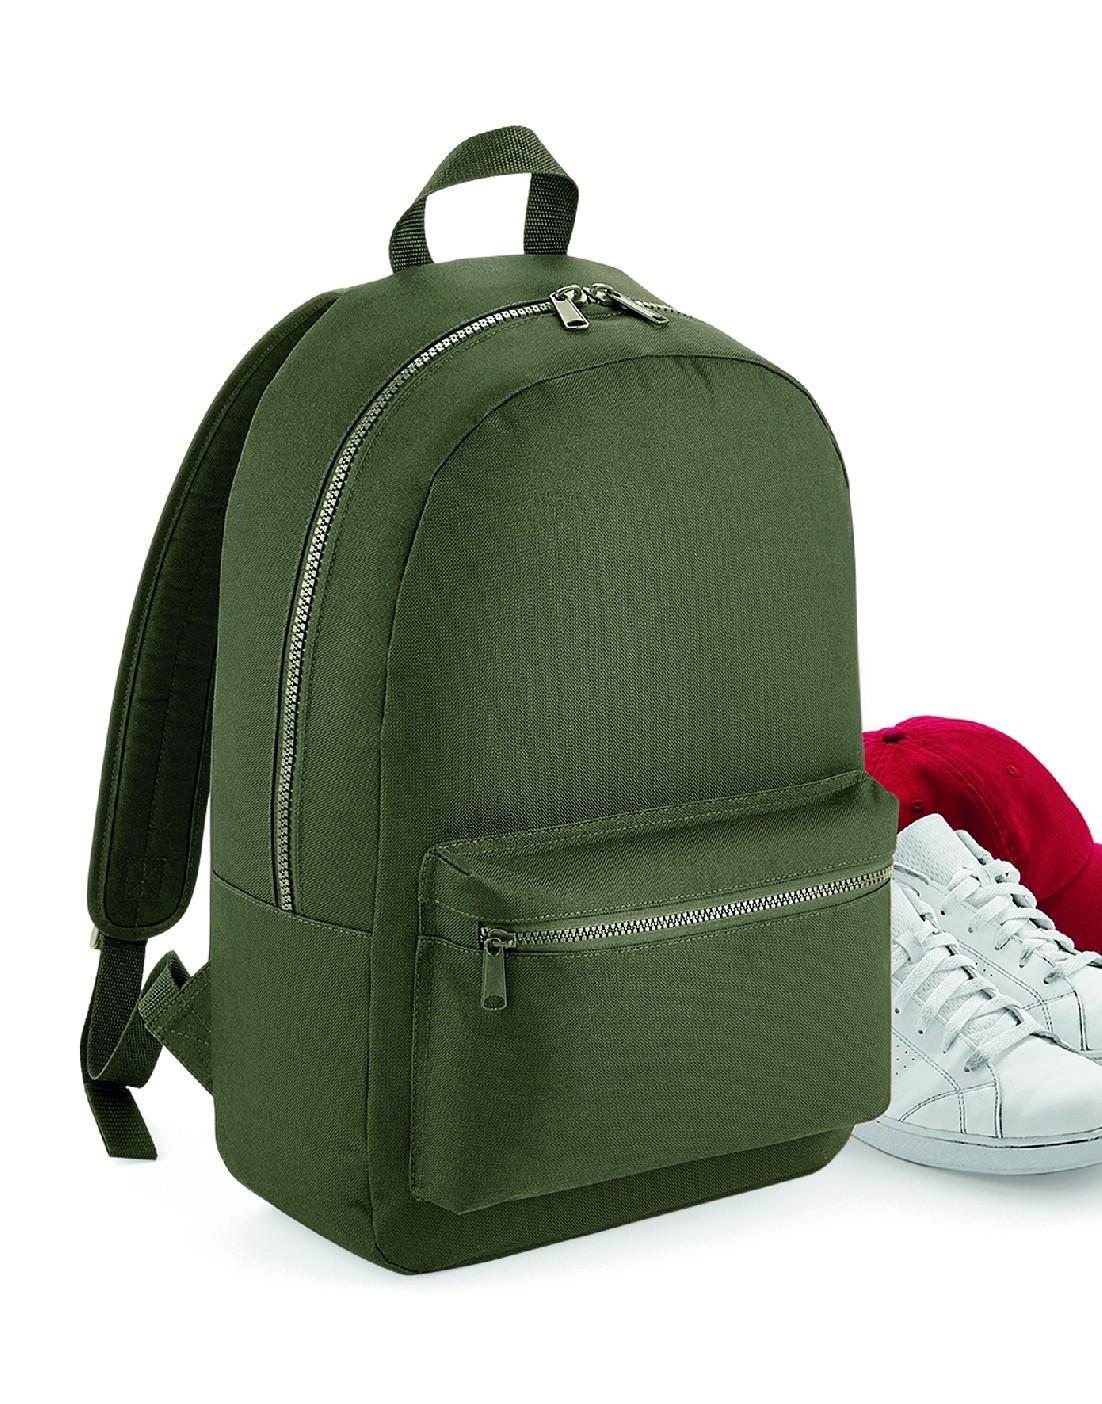 83e0664cf6 Bagbase Batoh Essential - zelený